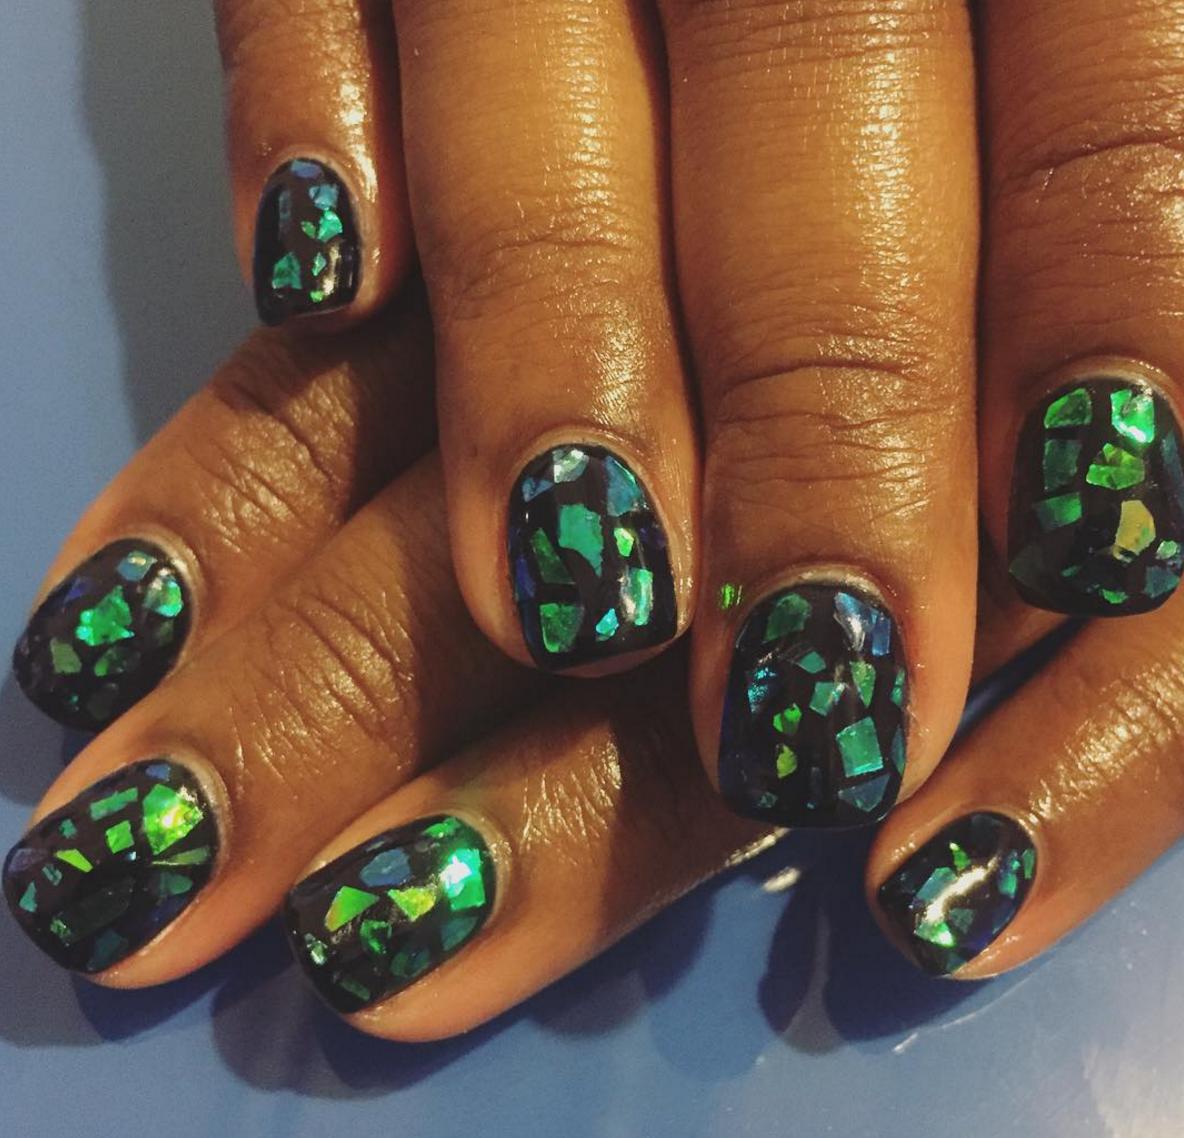 Dark opal nails. Image: sweetandsavvynails/Instagram